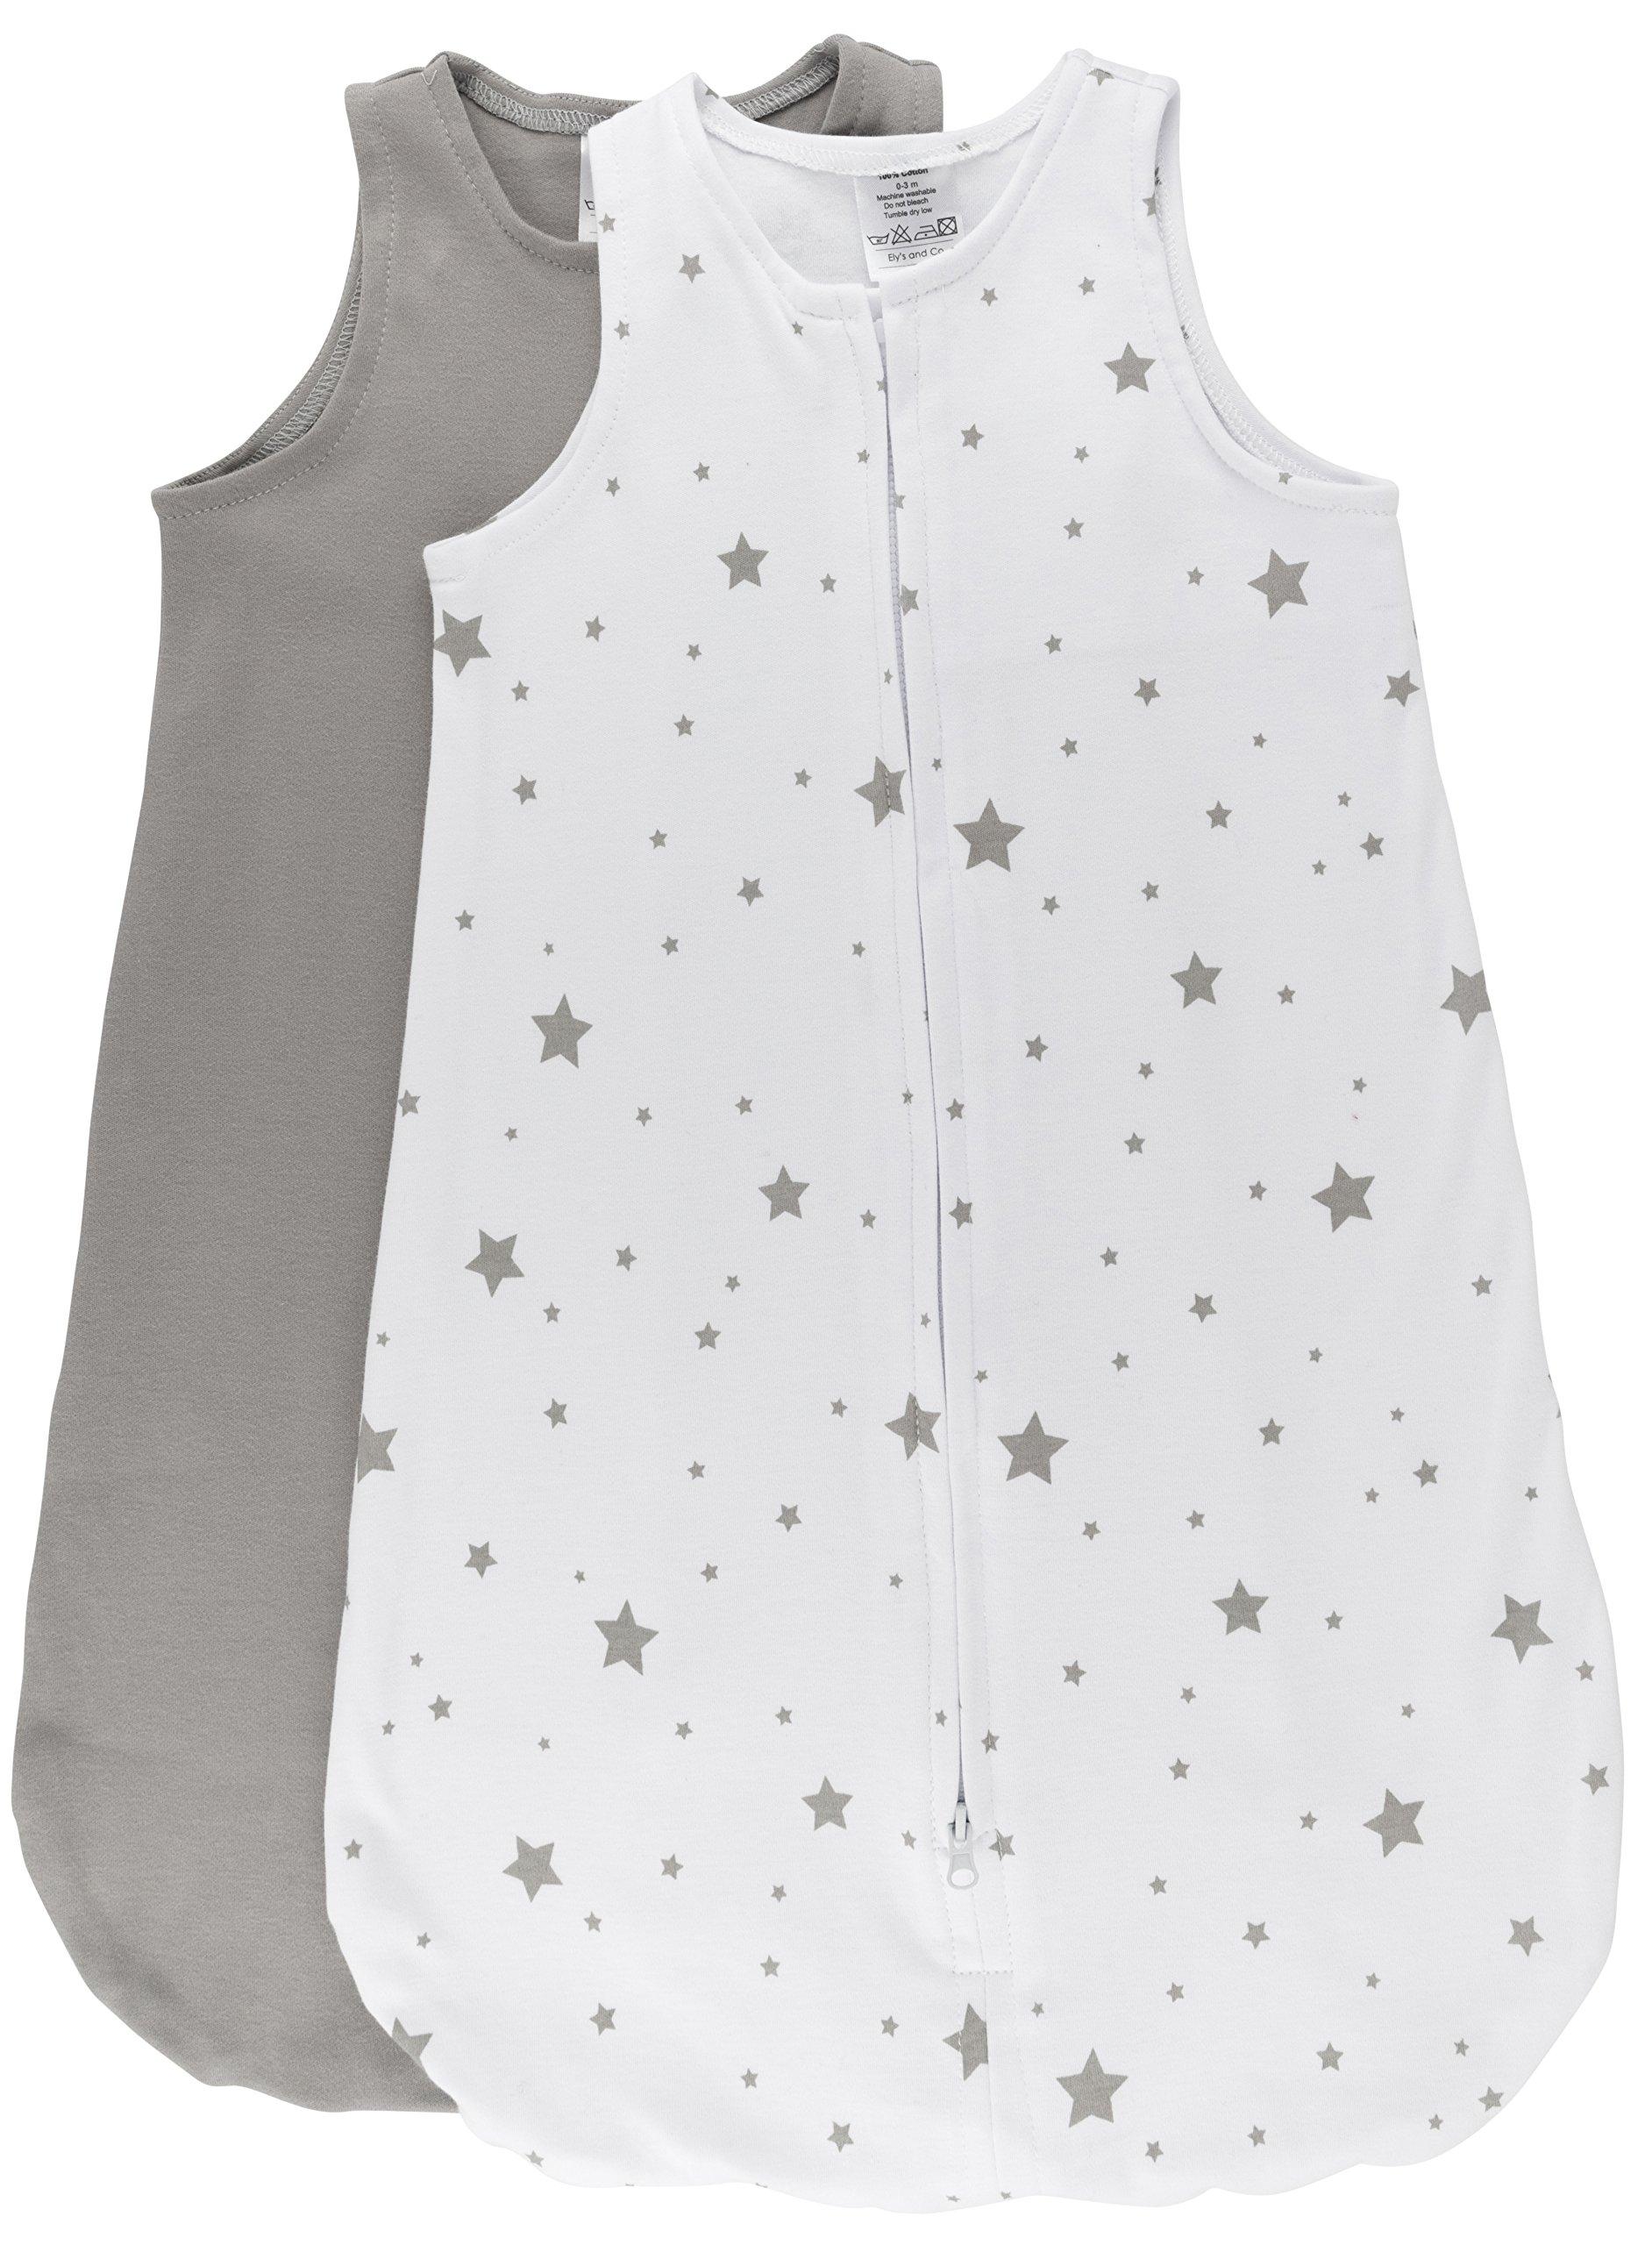 100% Cotton Wearable Blanket Baby Sleep Bag Grey Stars 2 Pack (0-3 Months)